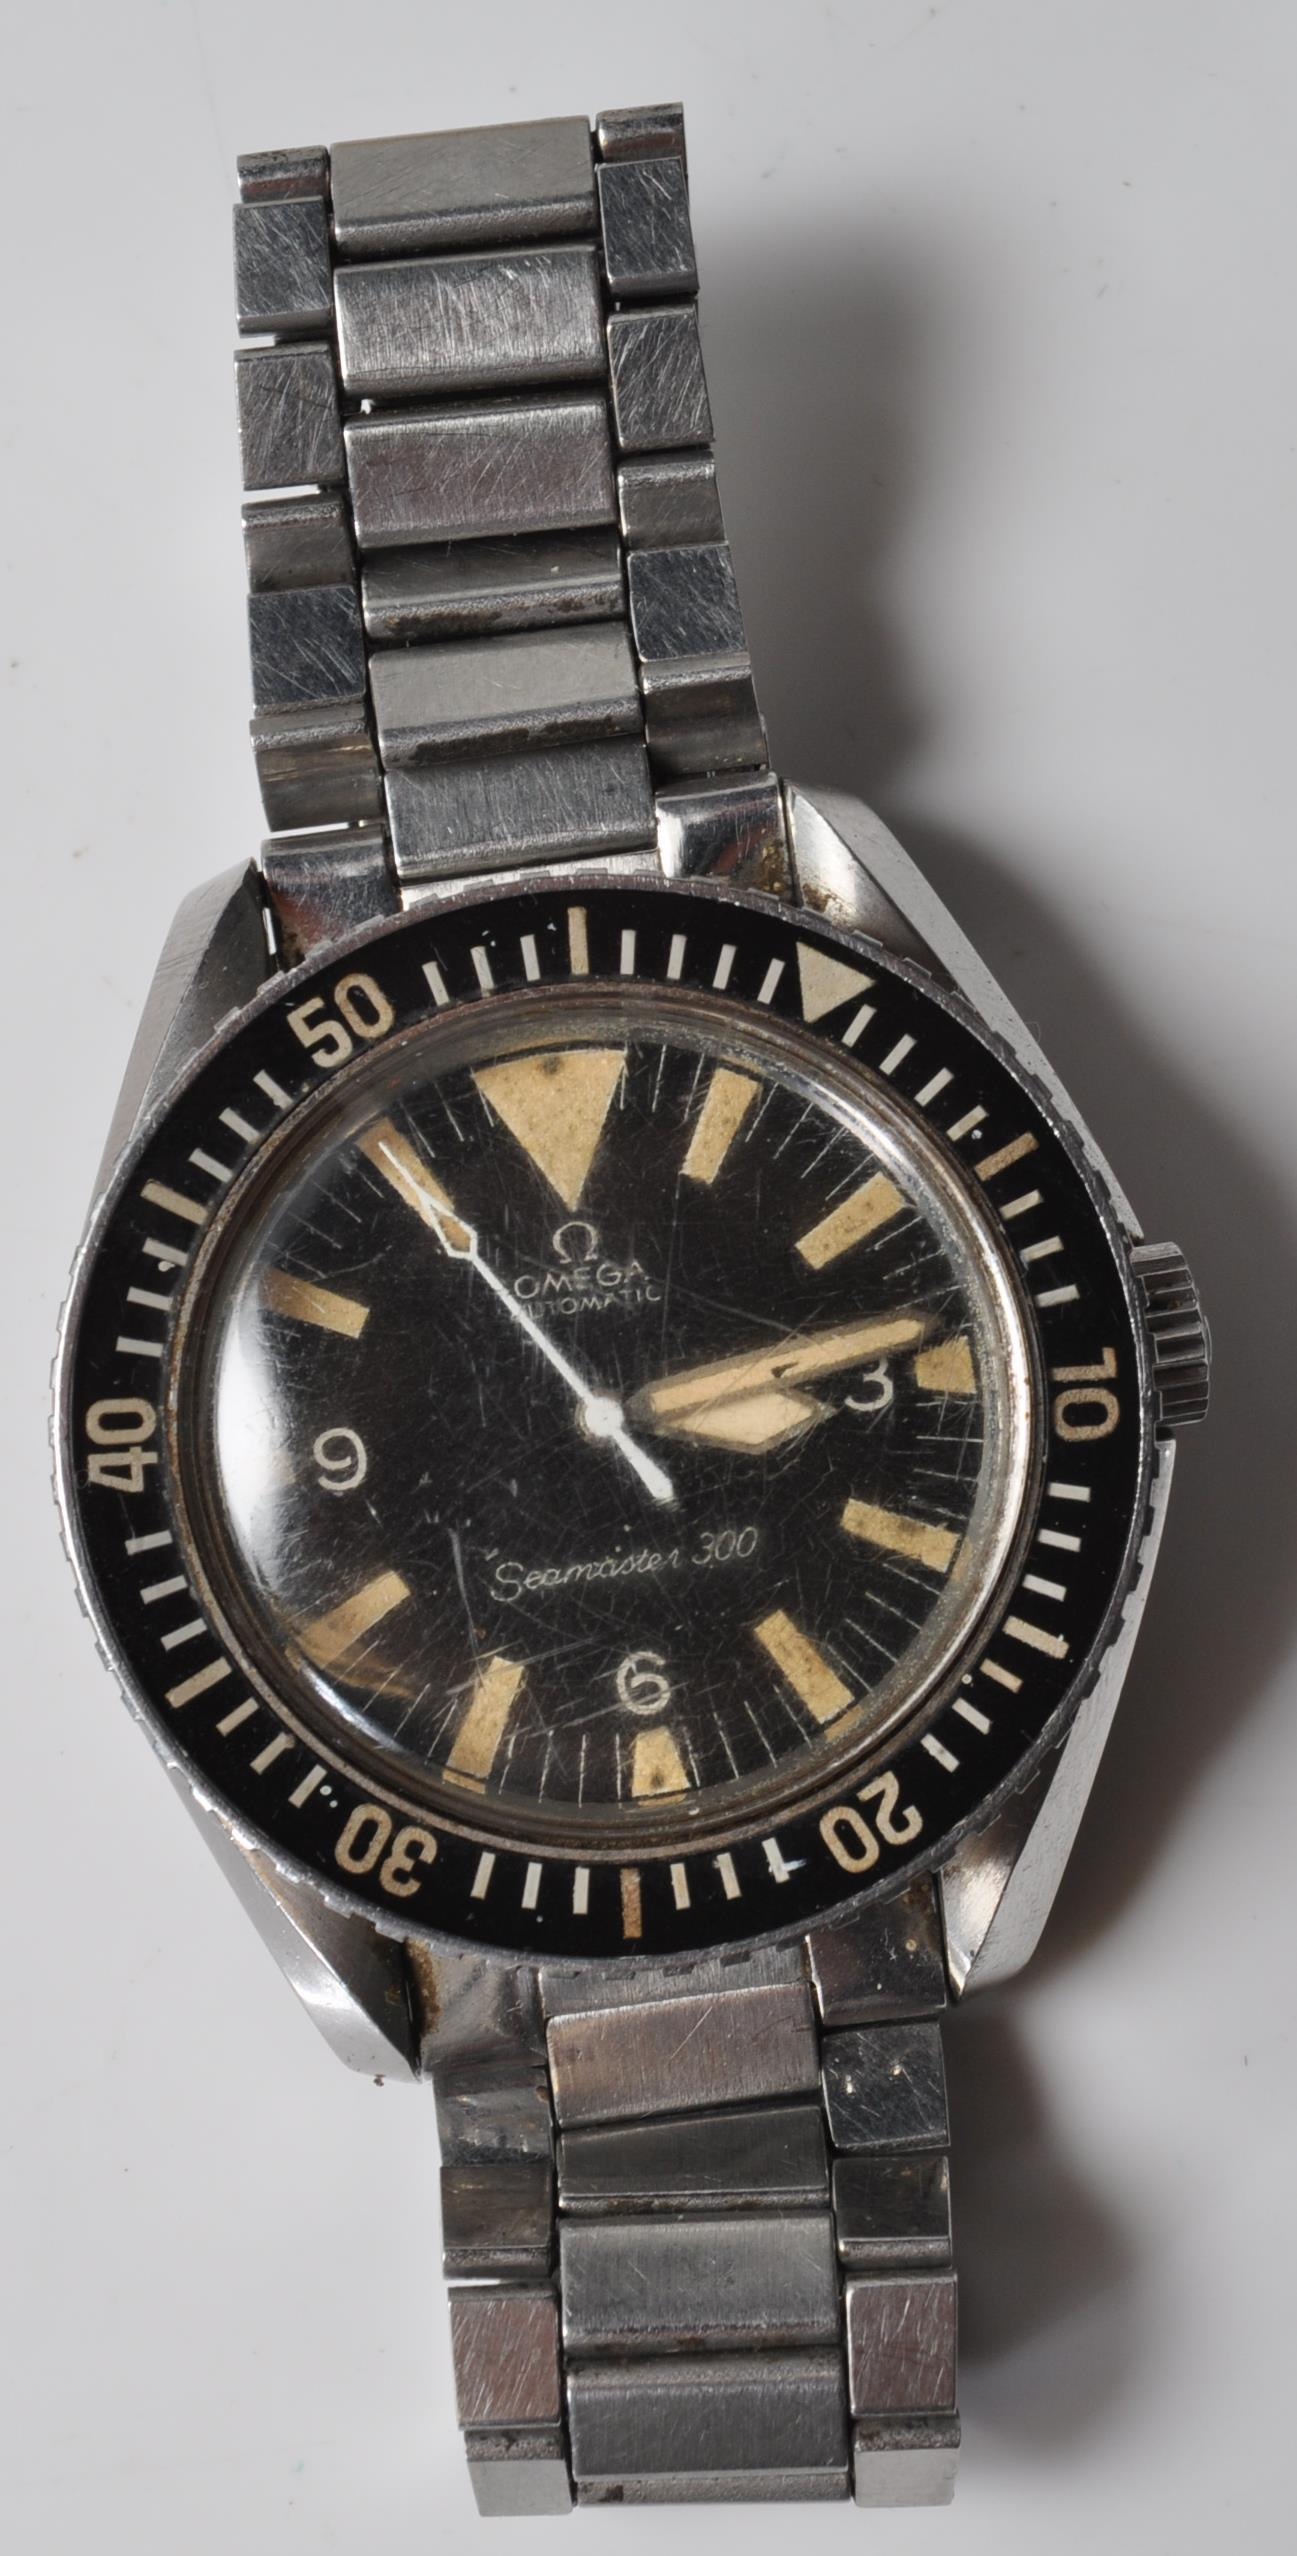 VINTAGE 1960'S OMEGA SEAMASTER 300 BIG TRIANGLE WRIST WATCH - Image 6 of 14